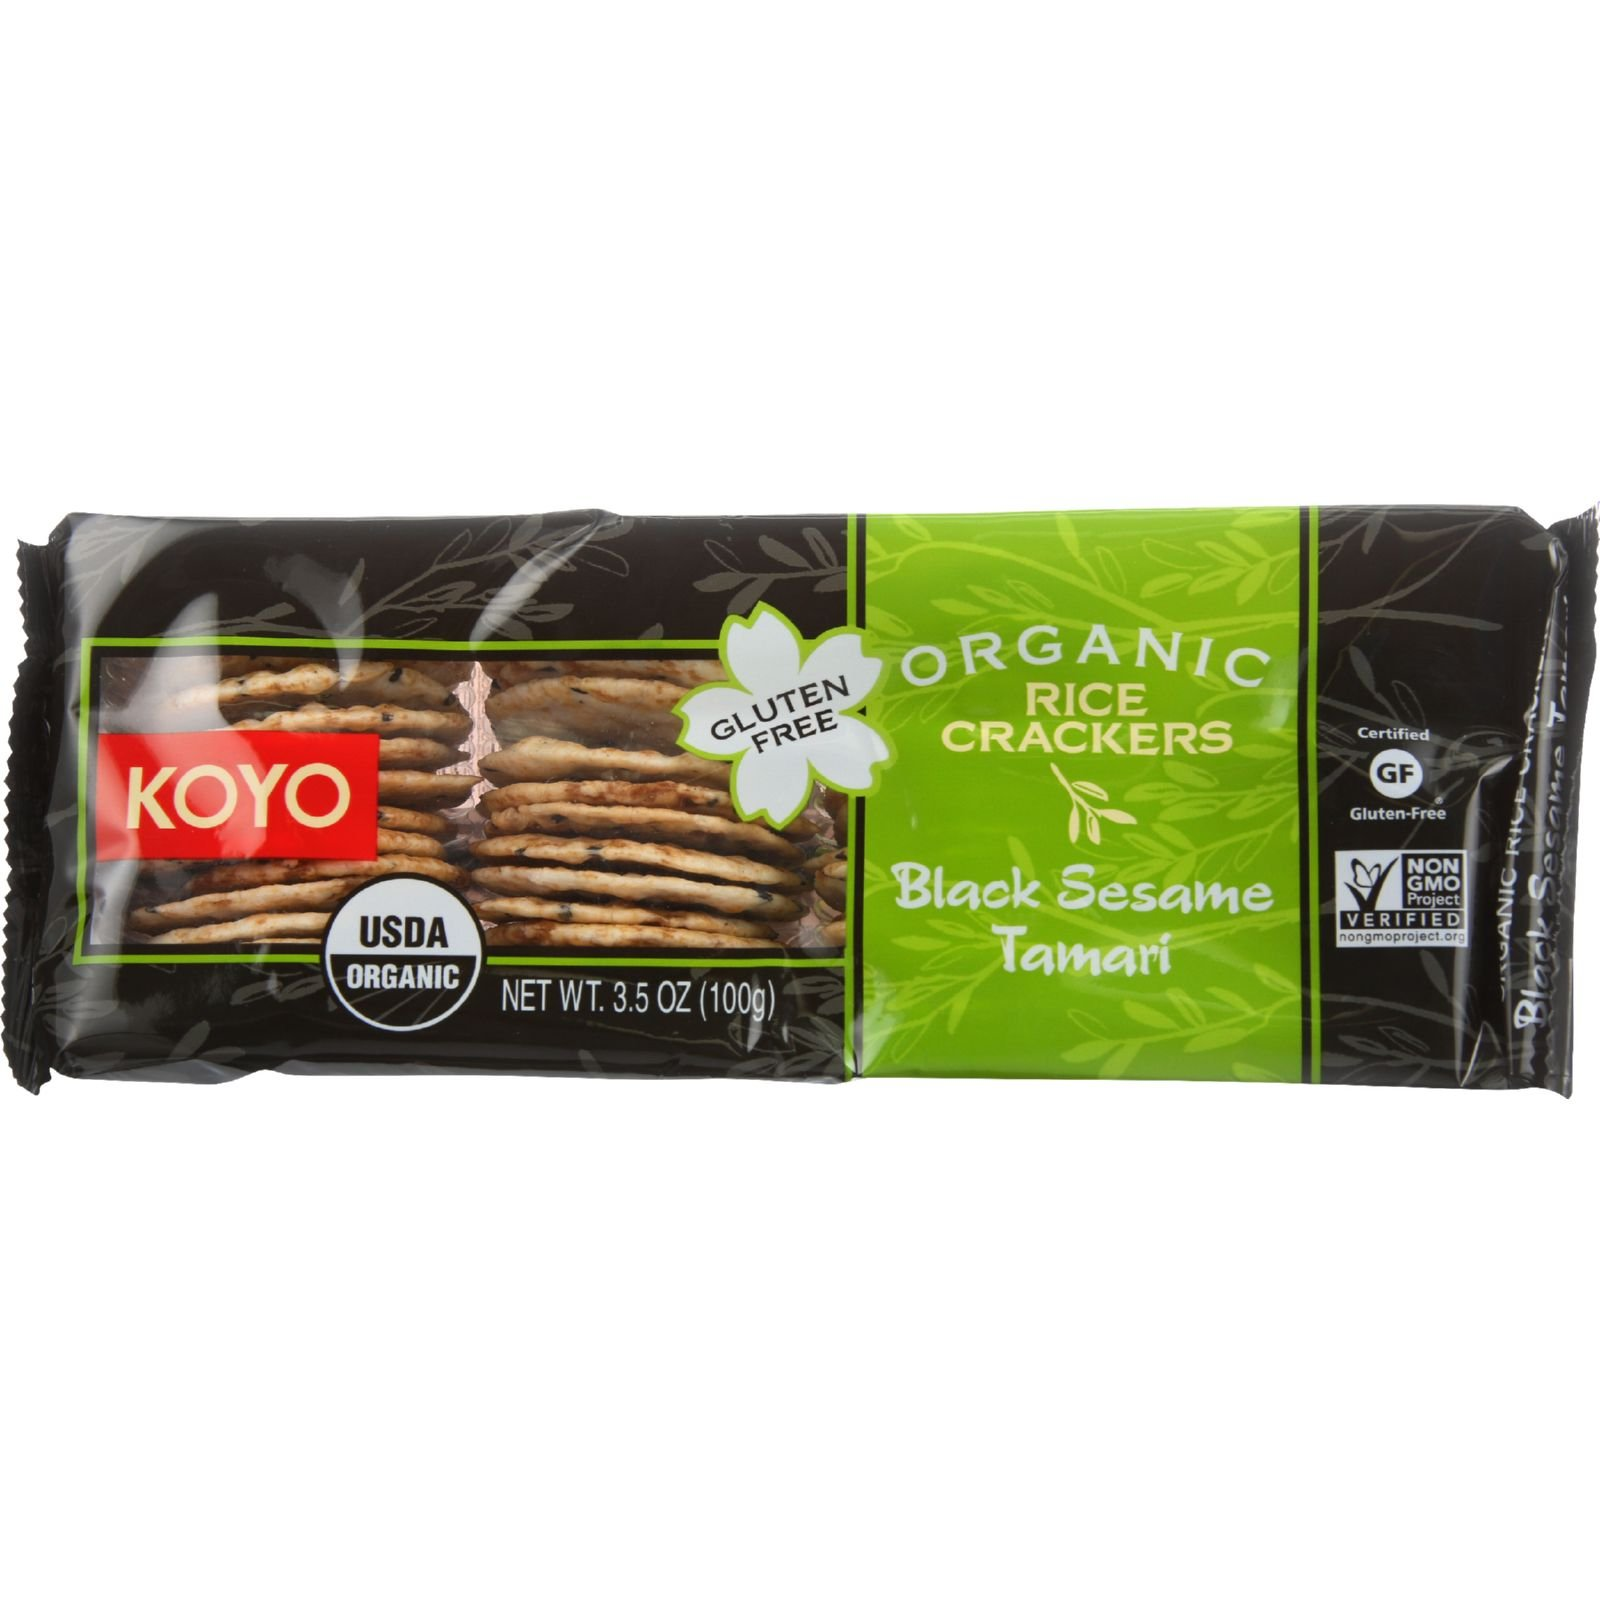 Koyo Organic Rice Crackers Black Sesame -- 3.5 Oz (Pack of 12)